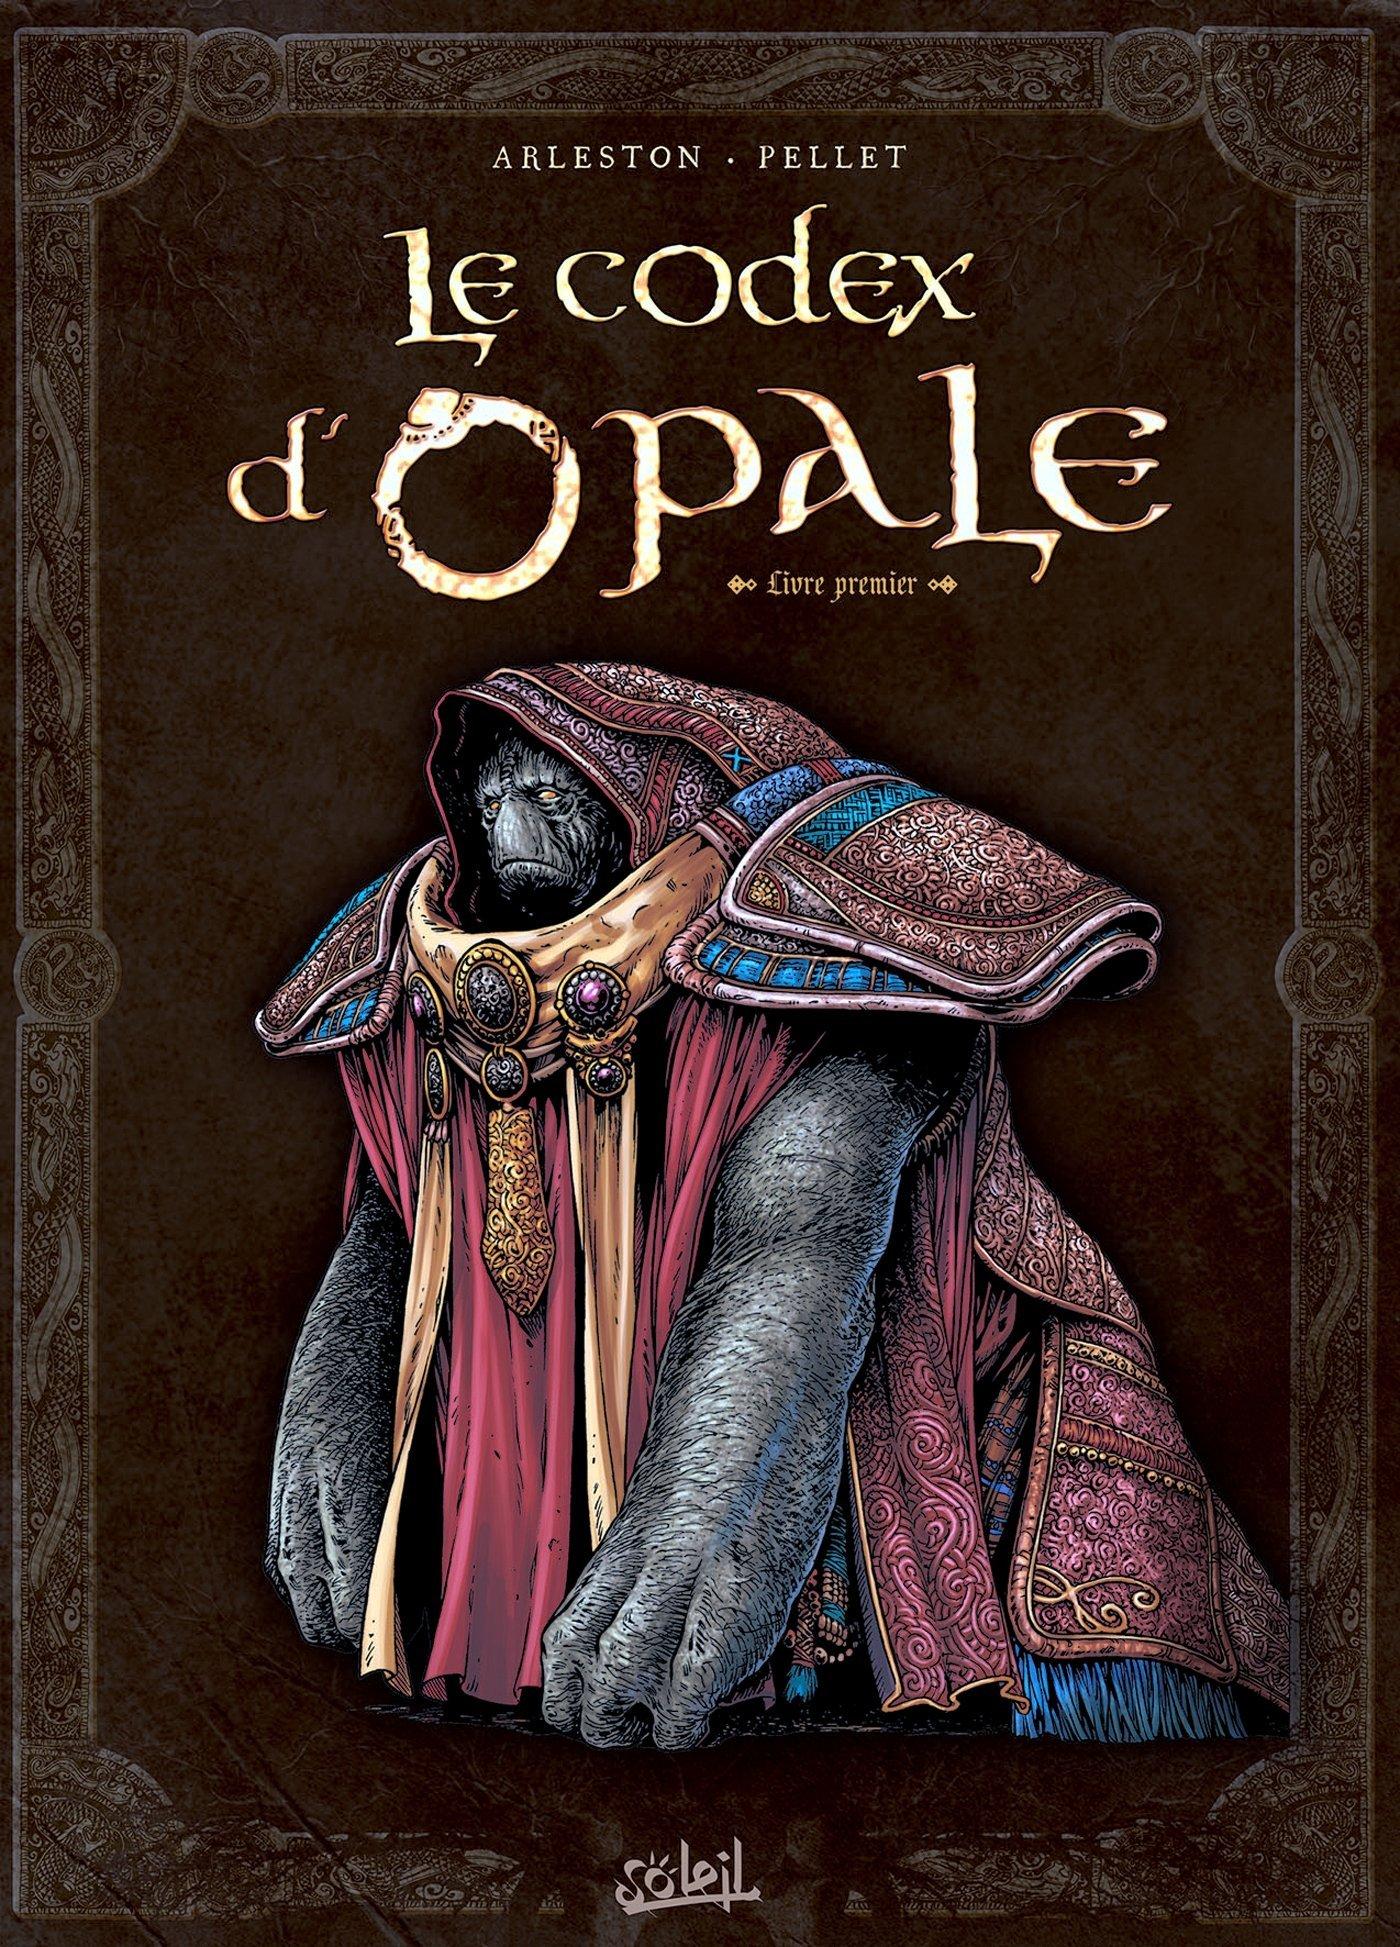 Le Codex d'Opale - Tome 1